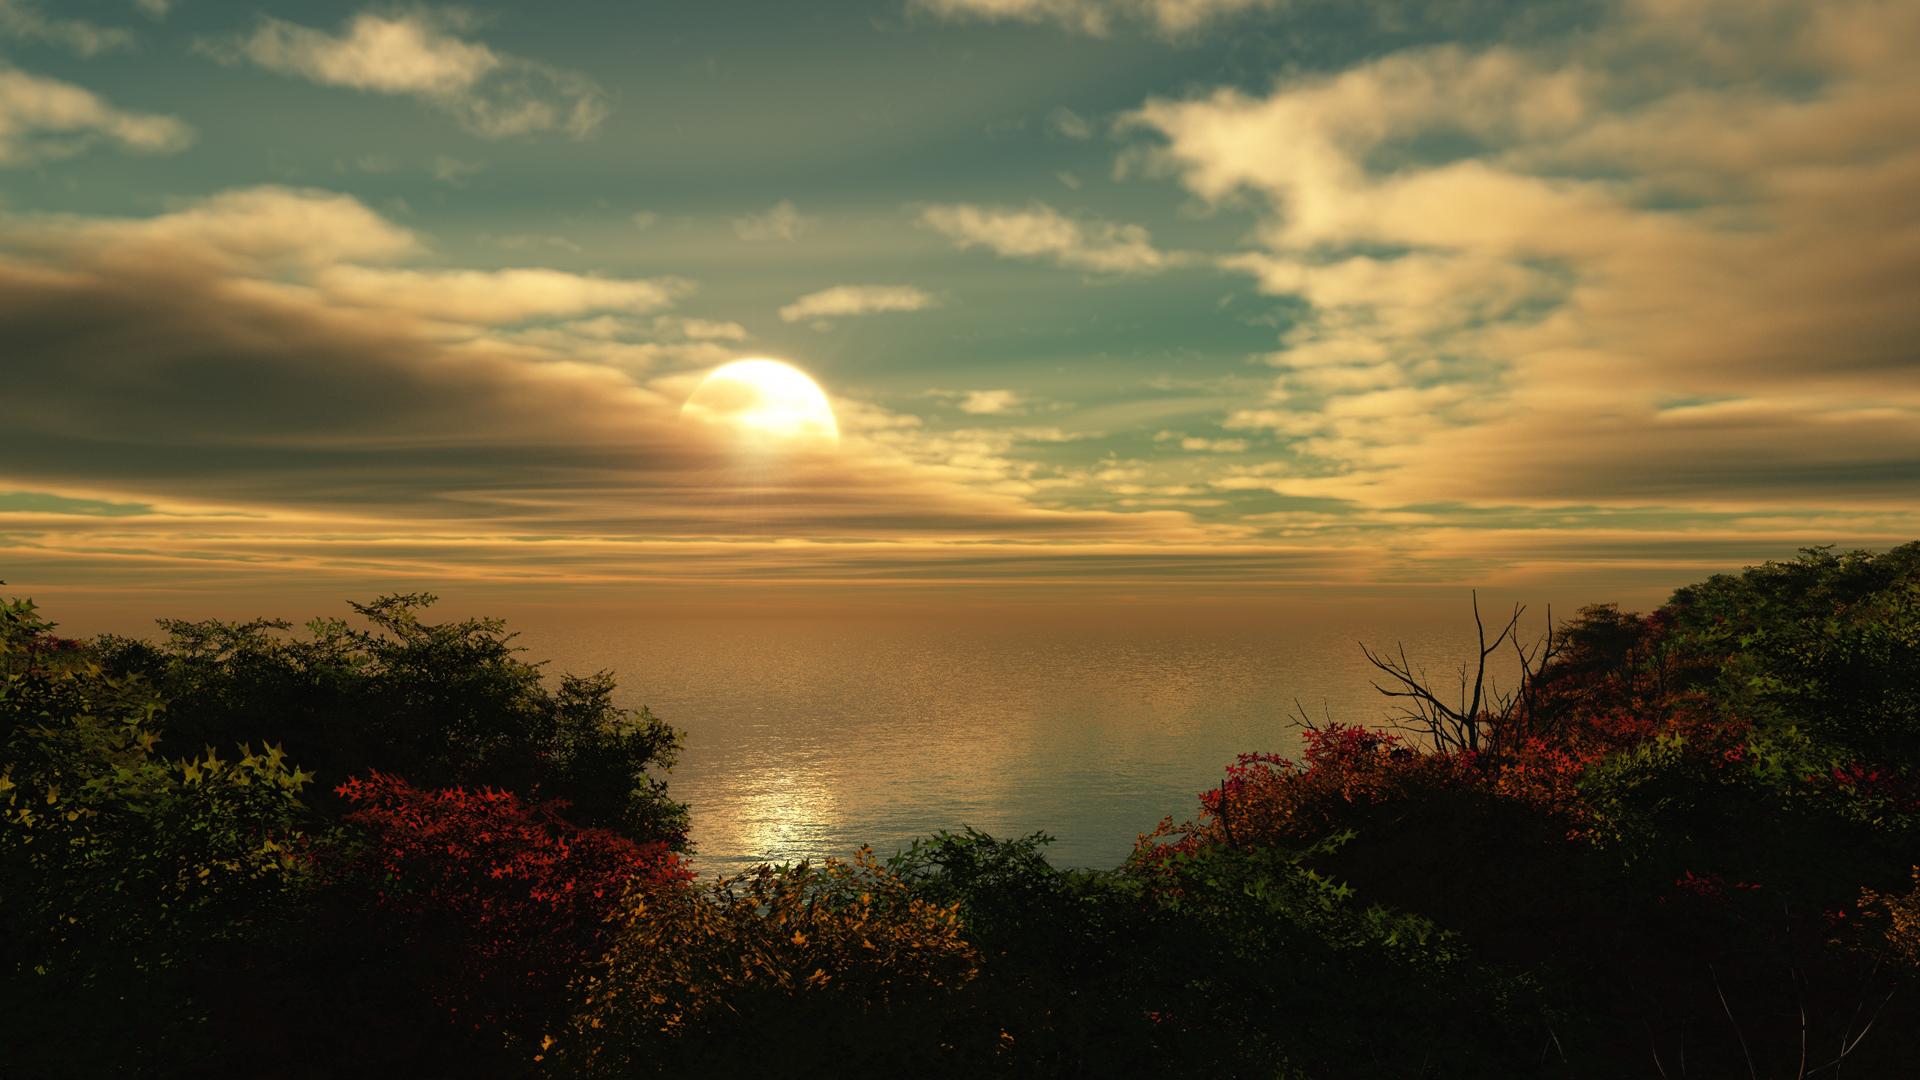 Fall Colors Wallpaper 1920x1080 Ocean Hd Wallpaper Background Image 1920x1080 Id